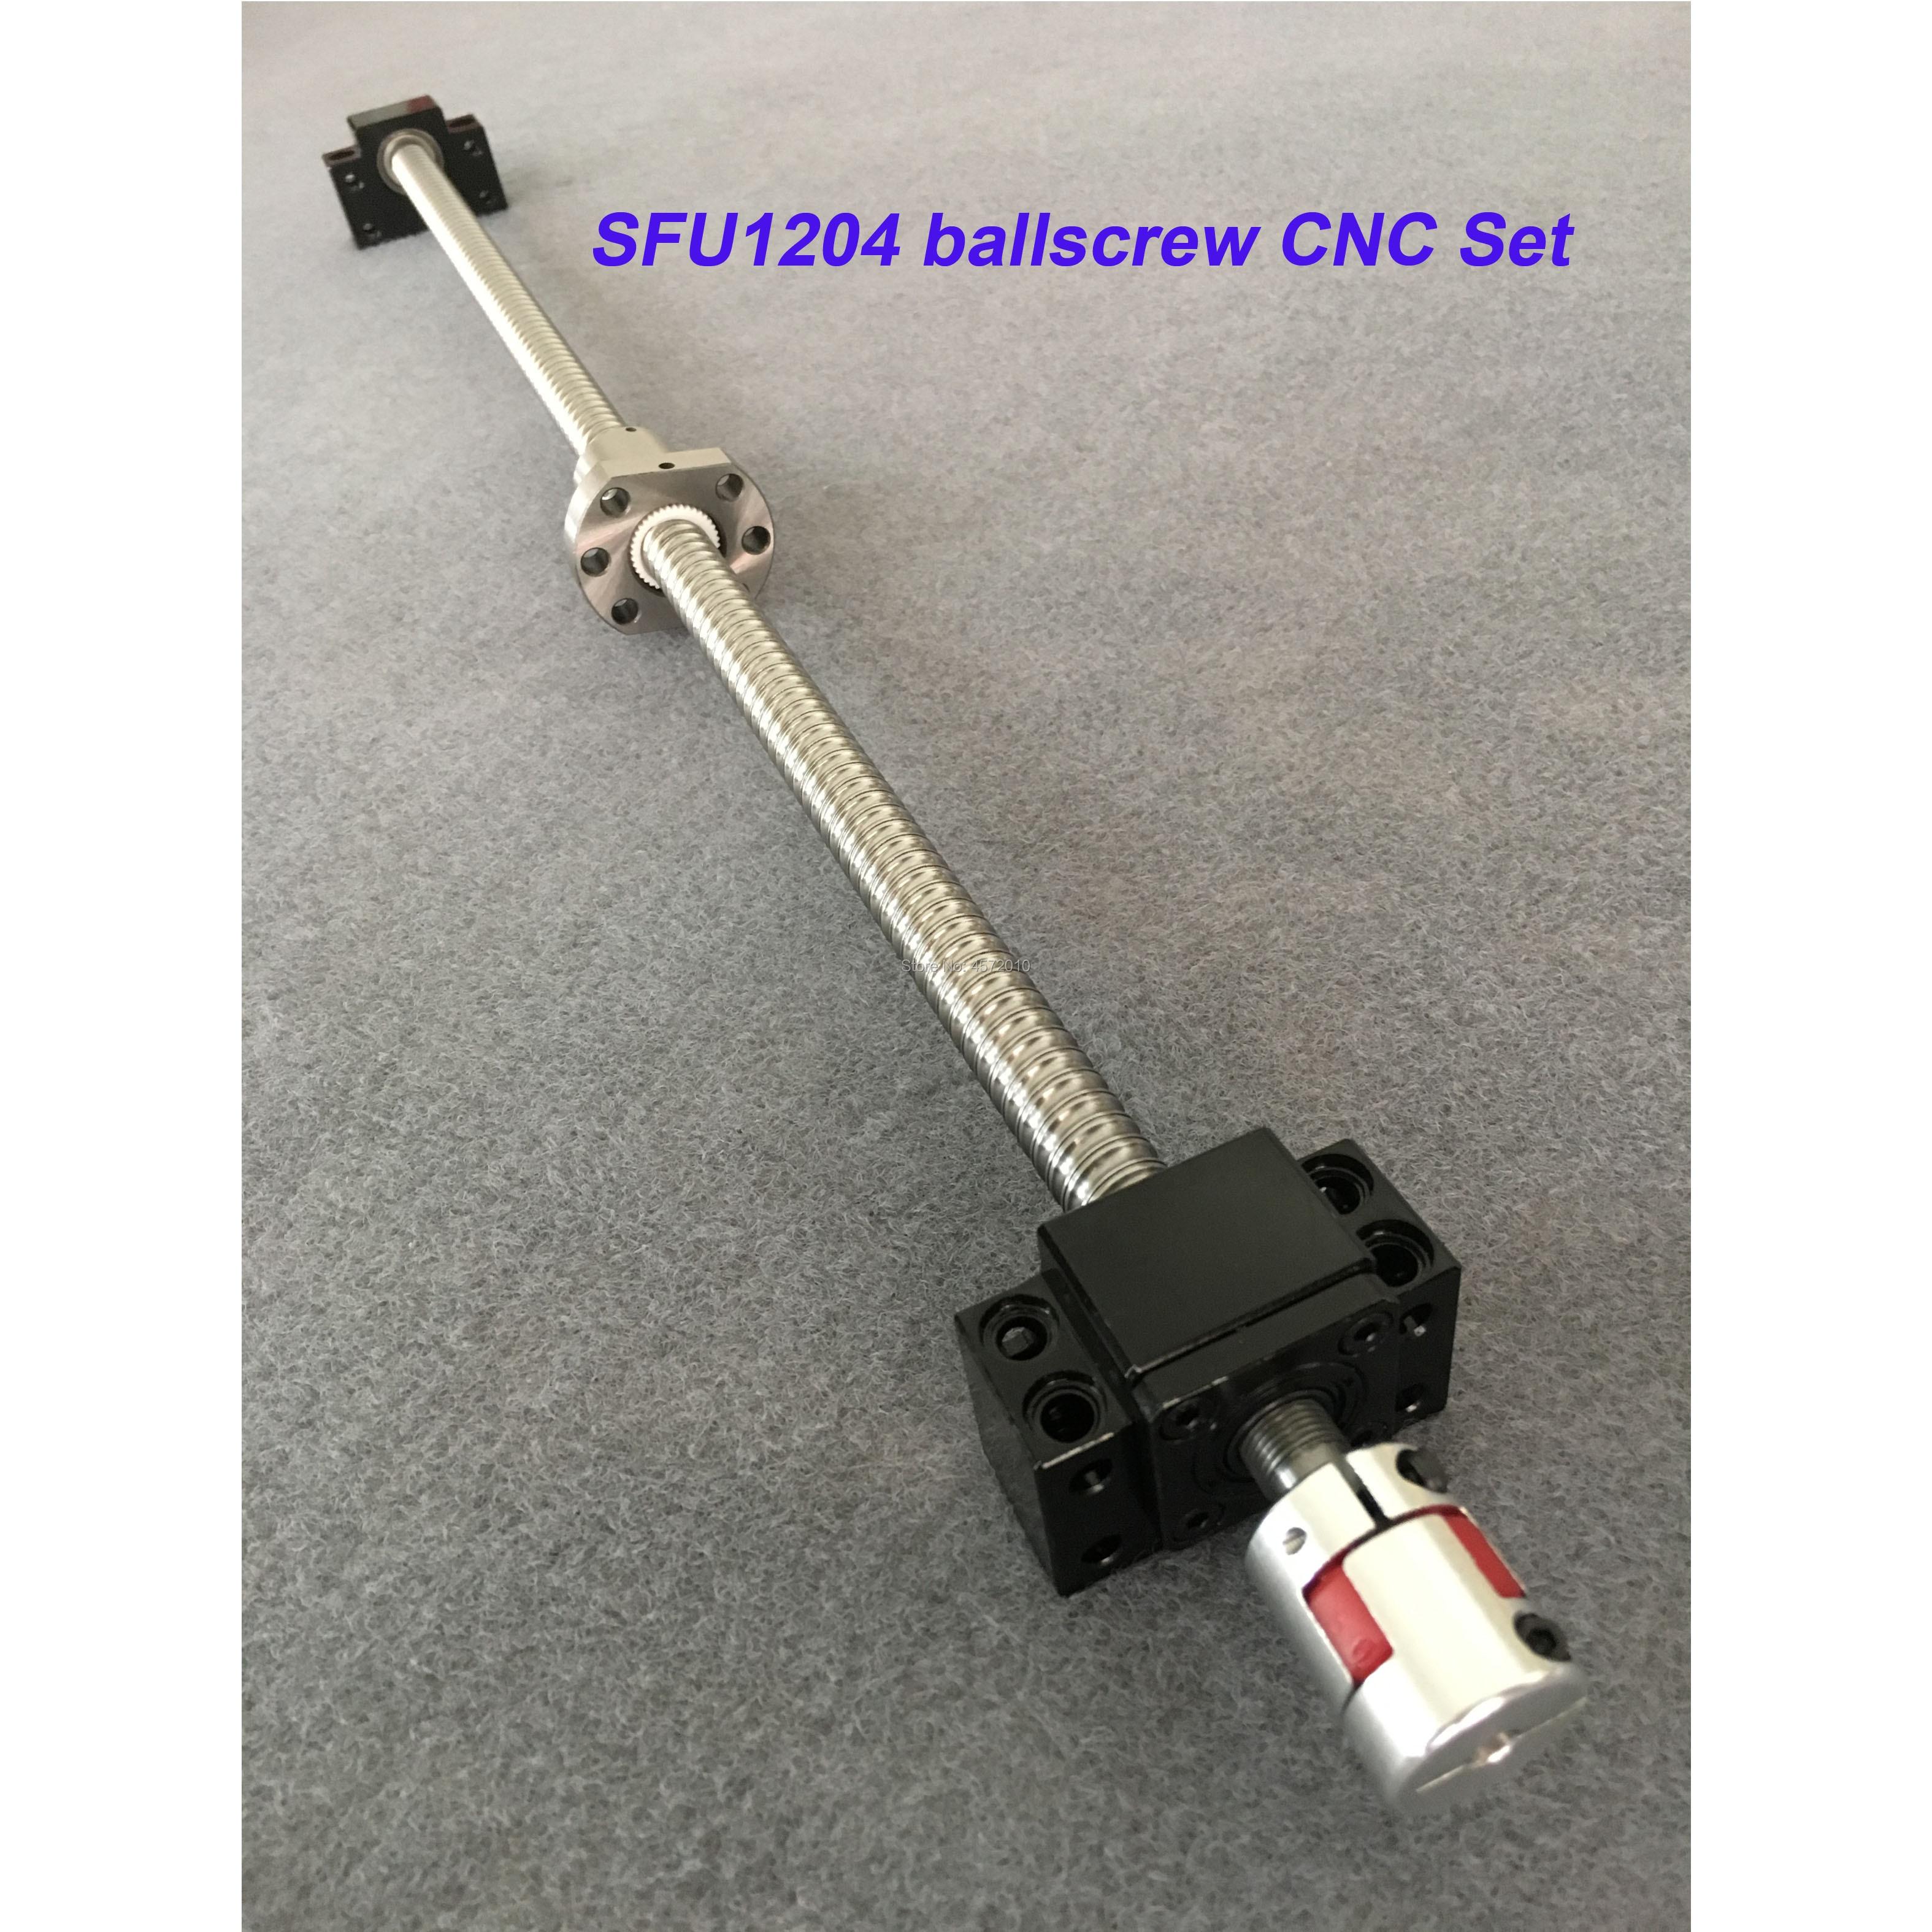 SFU1204 Ballscrew Set : 12MM Ball screw SFU1204 650 700 800 900 1000 mm end Machined +Ball Nut + BK10 BF10 Support for cnc partsSFU1204 Ballscrew Set : 12MM Ball screw SFU1204 650 700 800 900 1000 mm end Machined +Ball Nut + BK10 BF10 Support for cnc parts